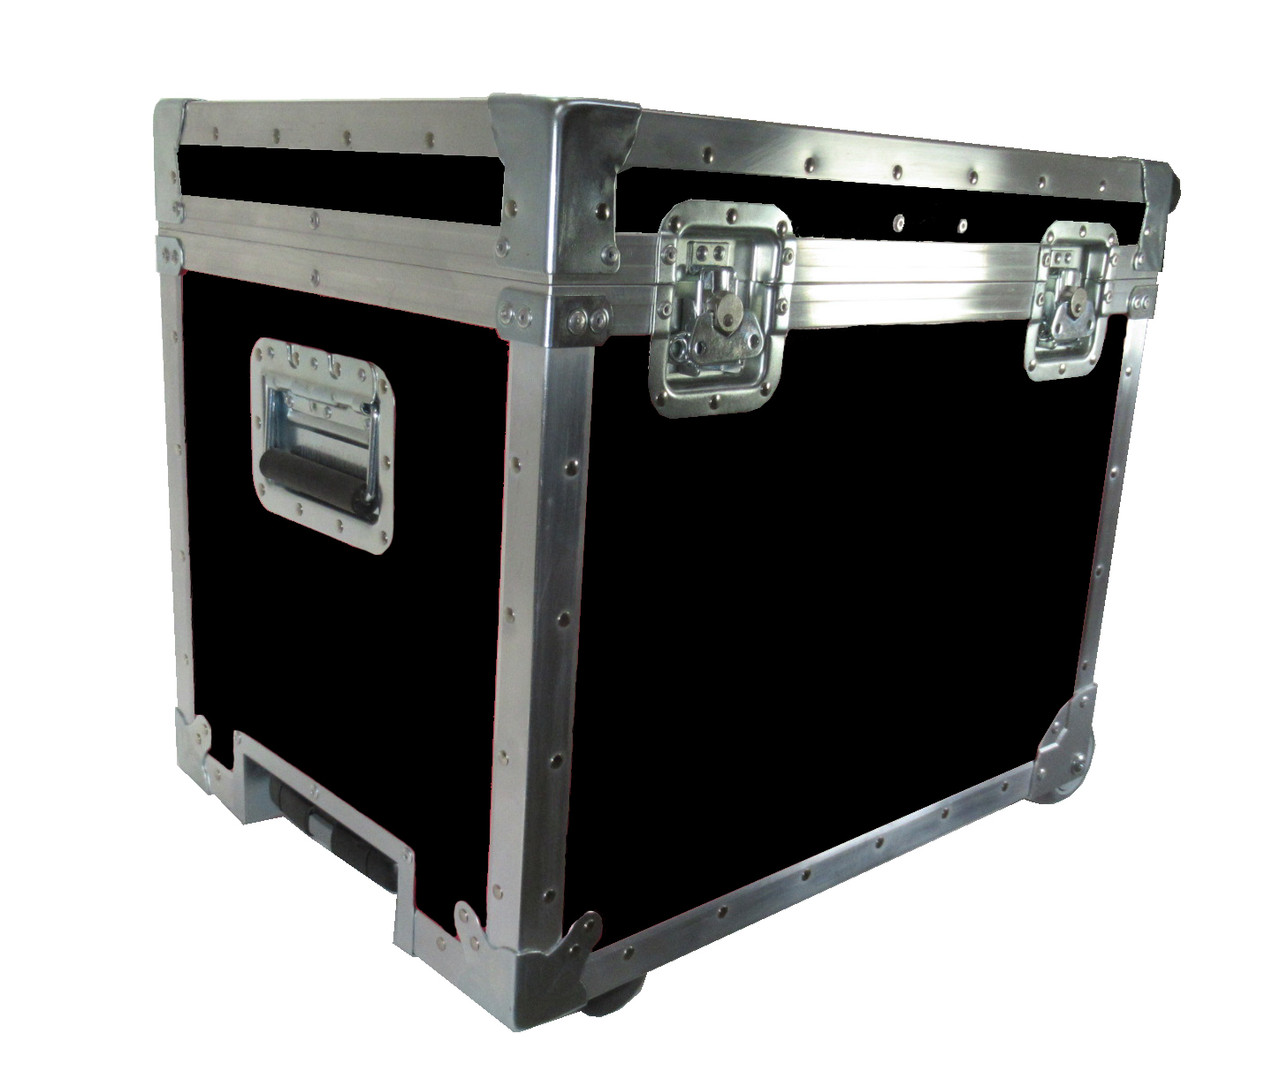 Panasonic Varicam 35 Shipping Case